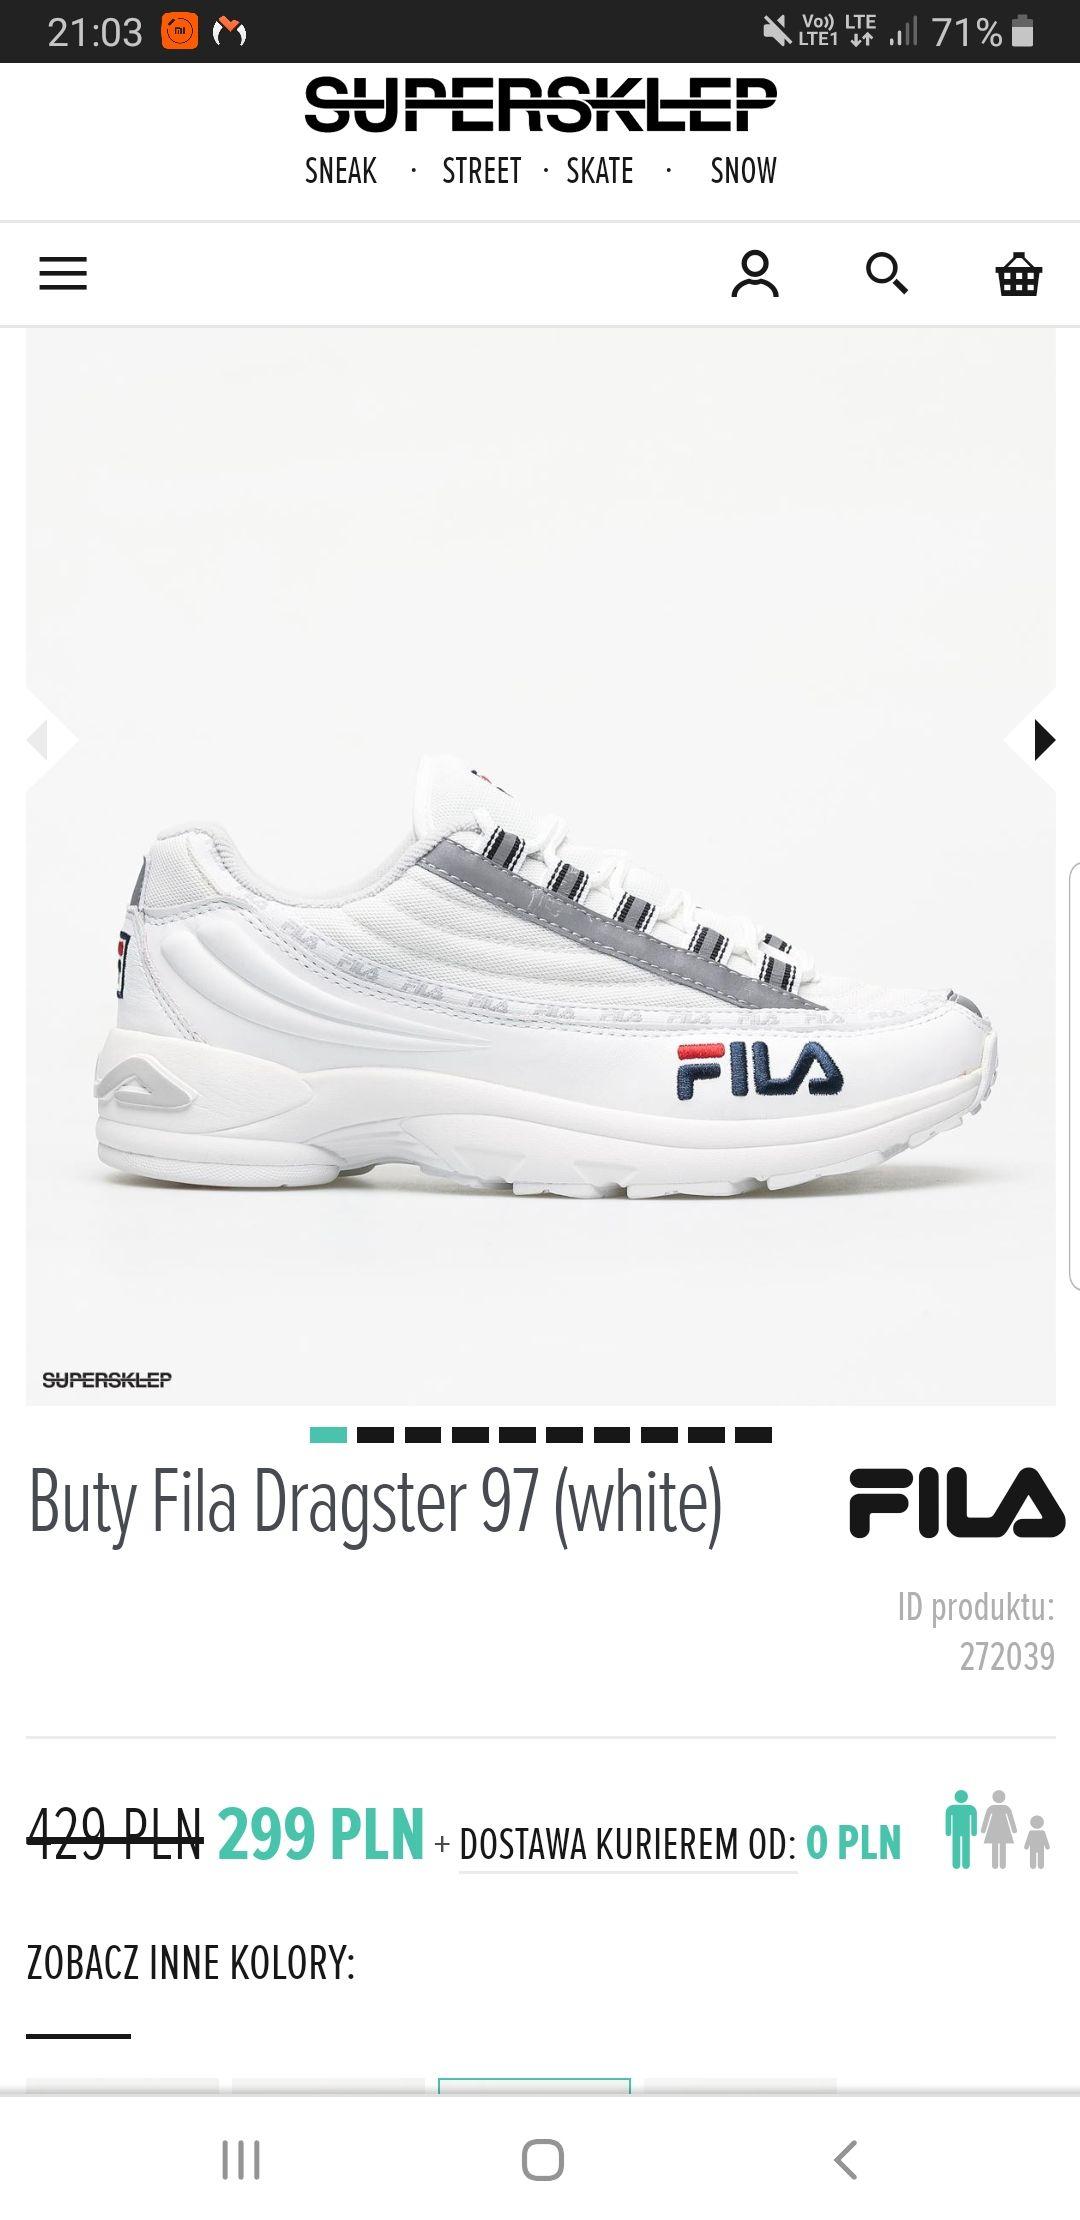 Buty Fila Dragster 97